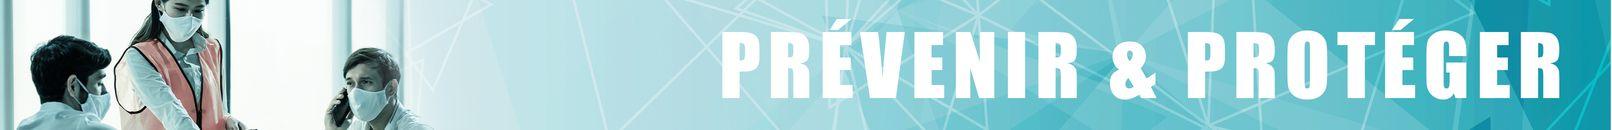 COVID19 - Prévenir, protéger